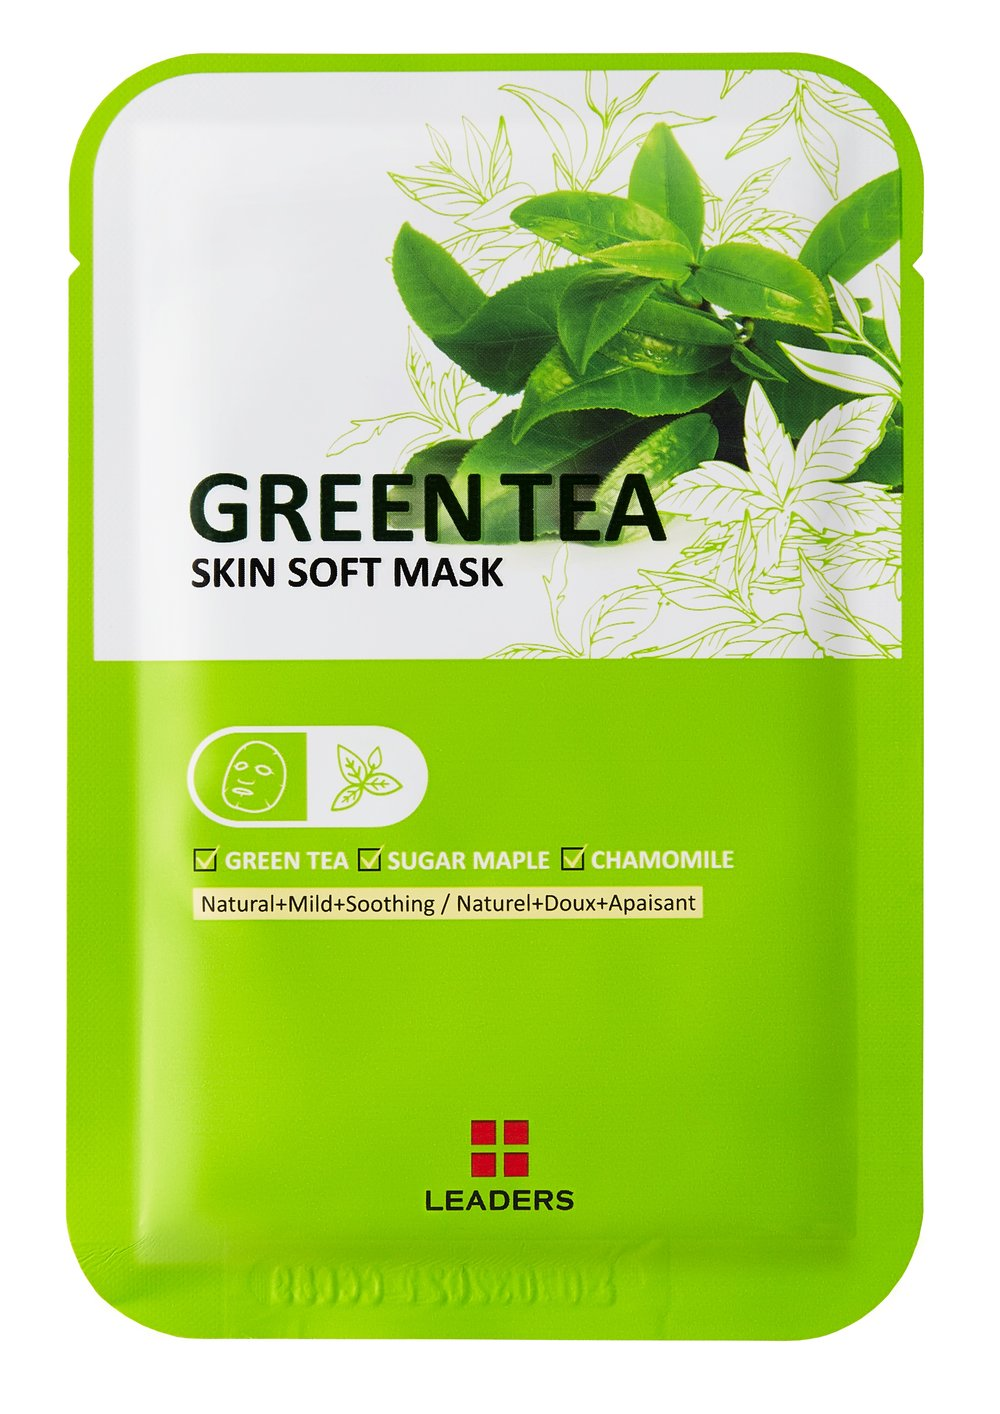 SkinSoft_Green Tea.jpg